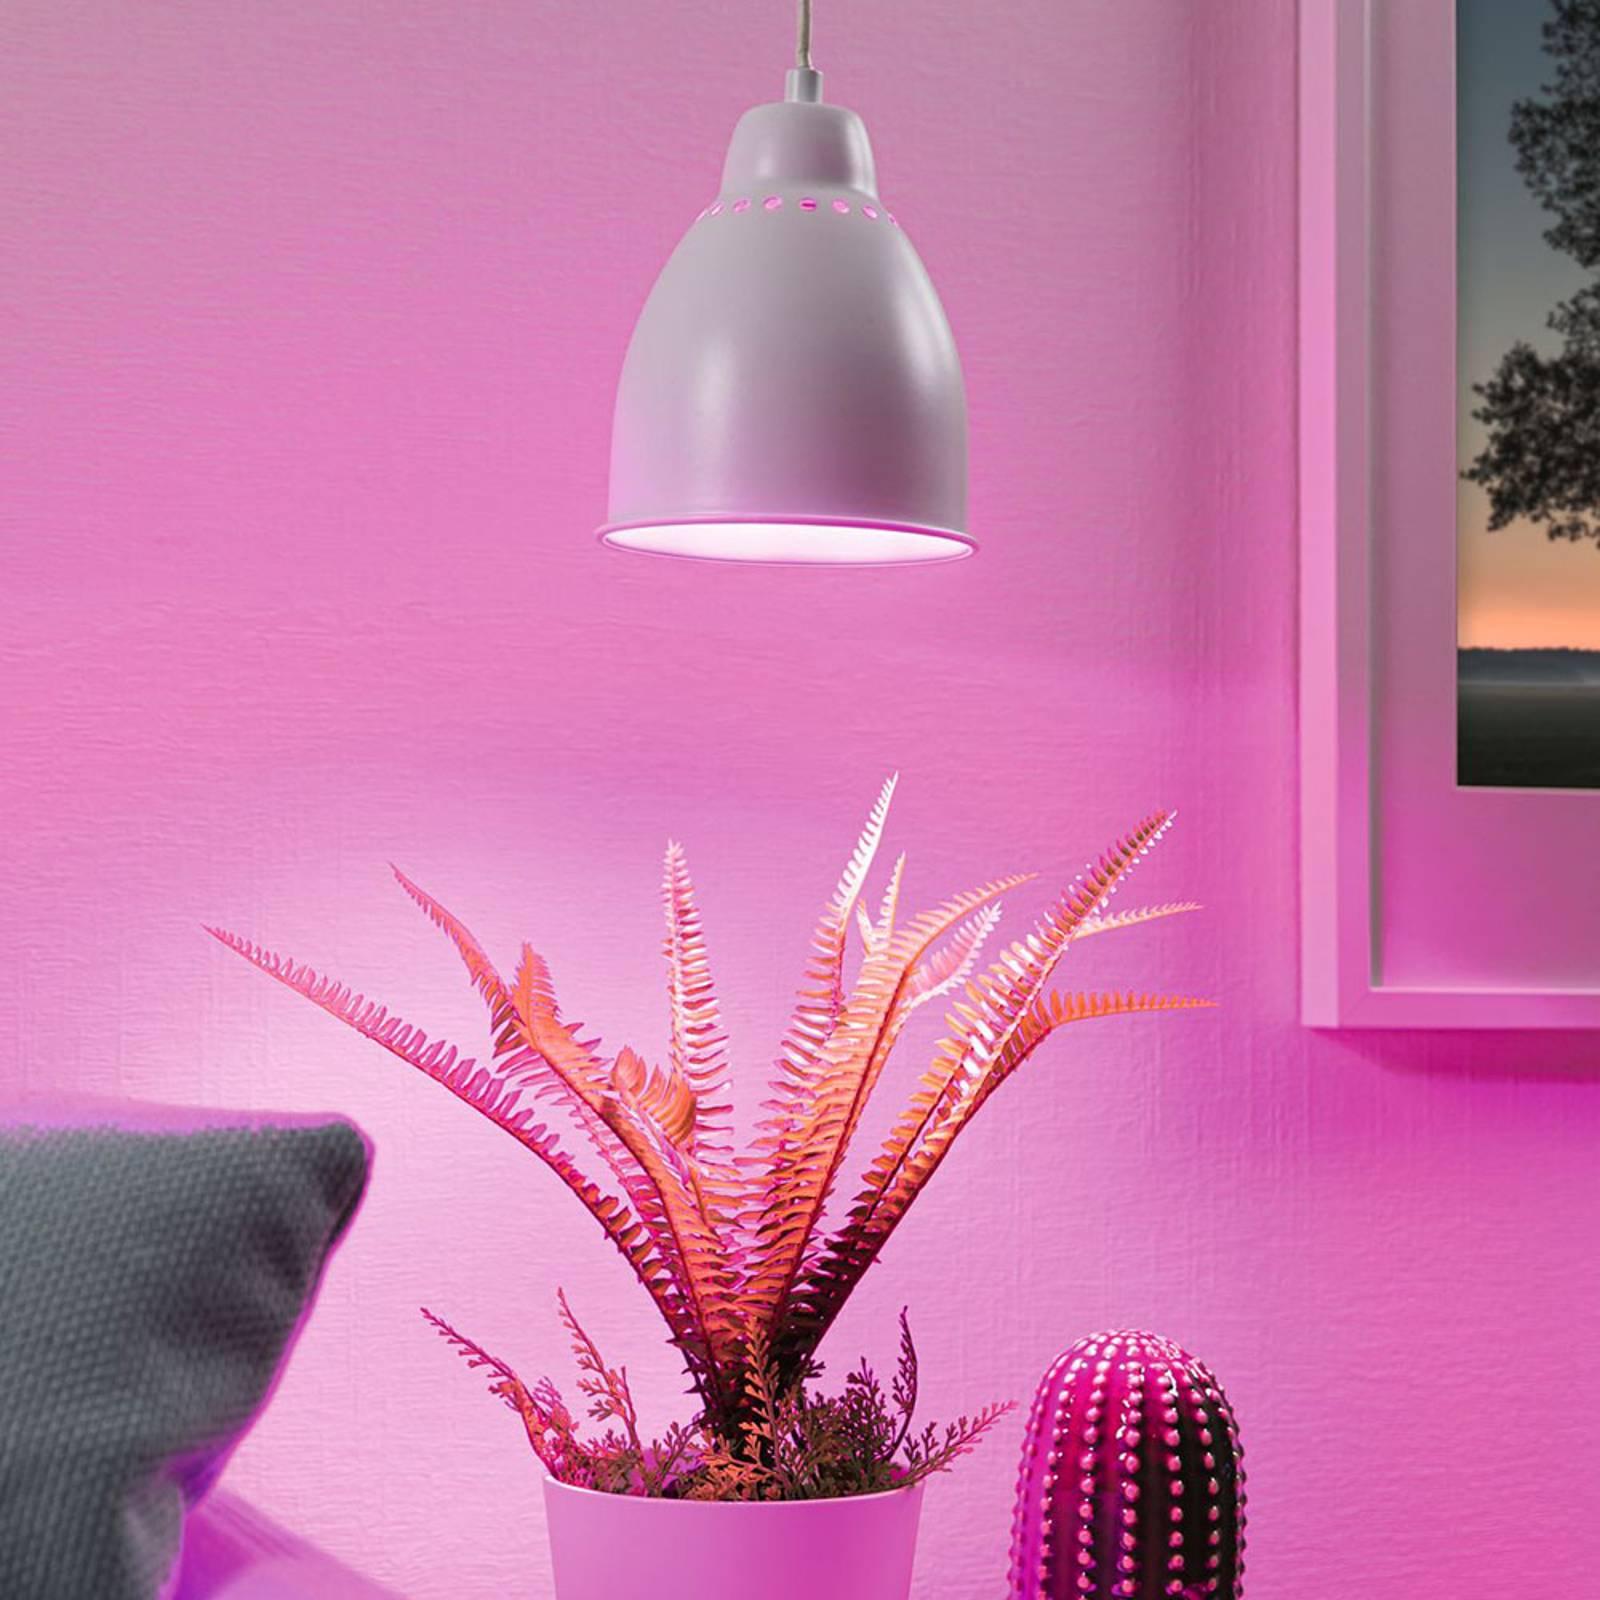 Paulmann Neordic Hilla hanglamp, wit